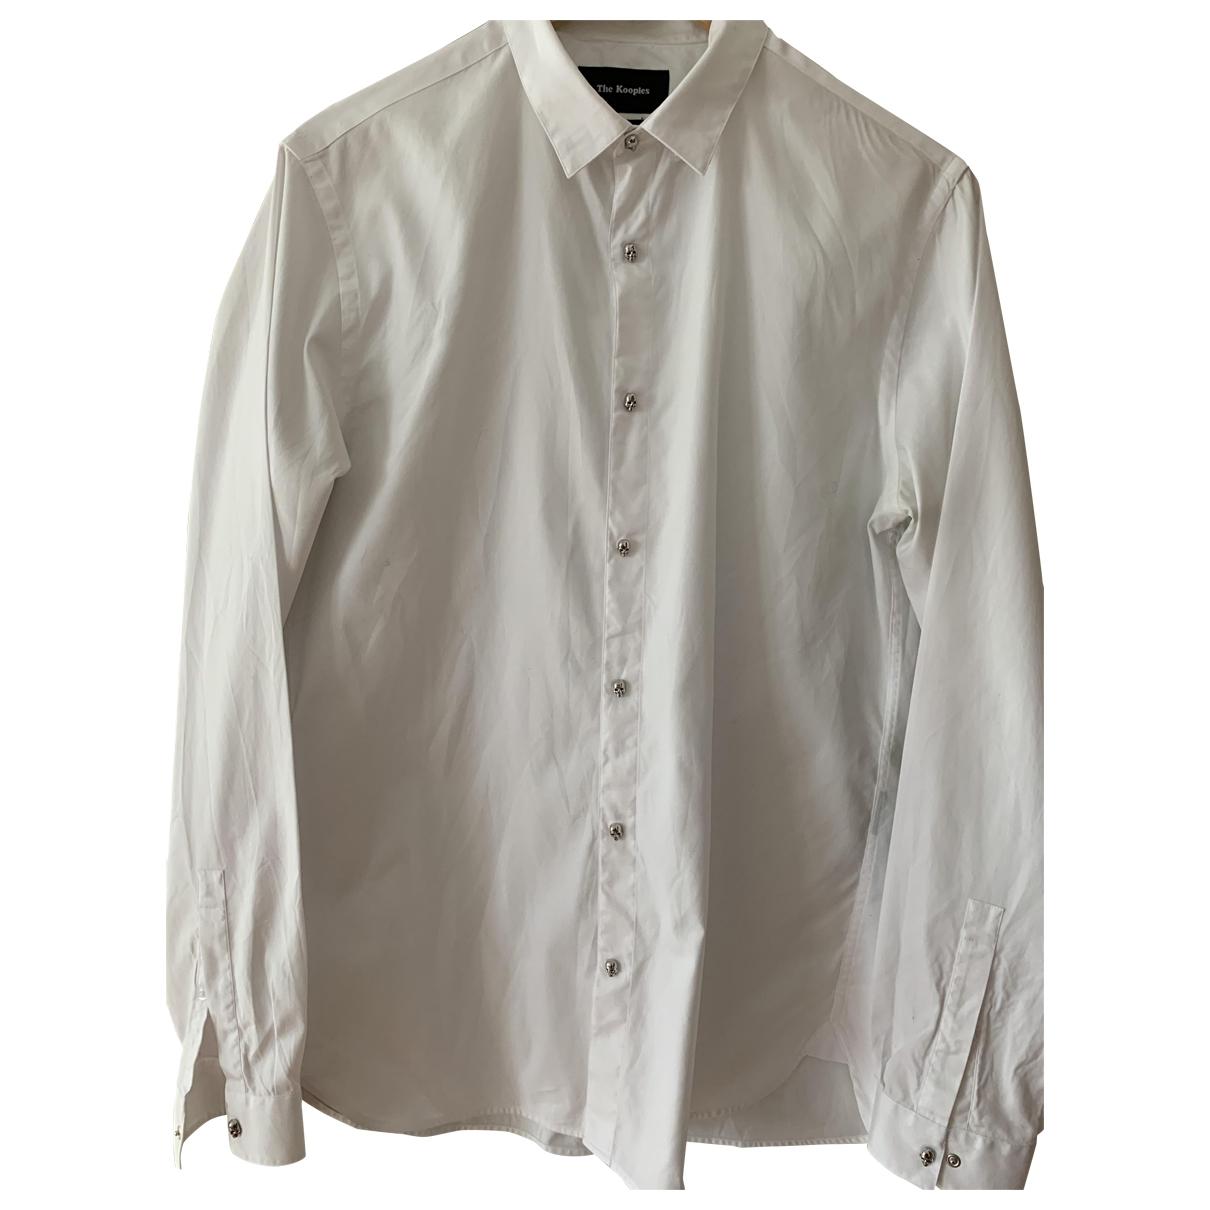 The Kooples \N White Cotton Shirts for Men M International